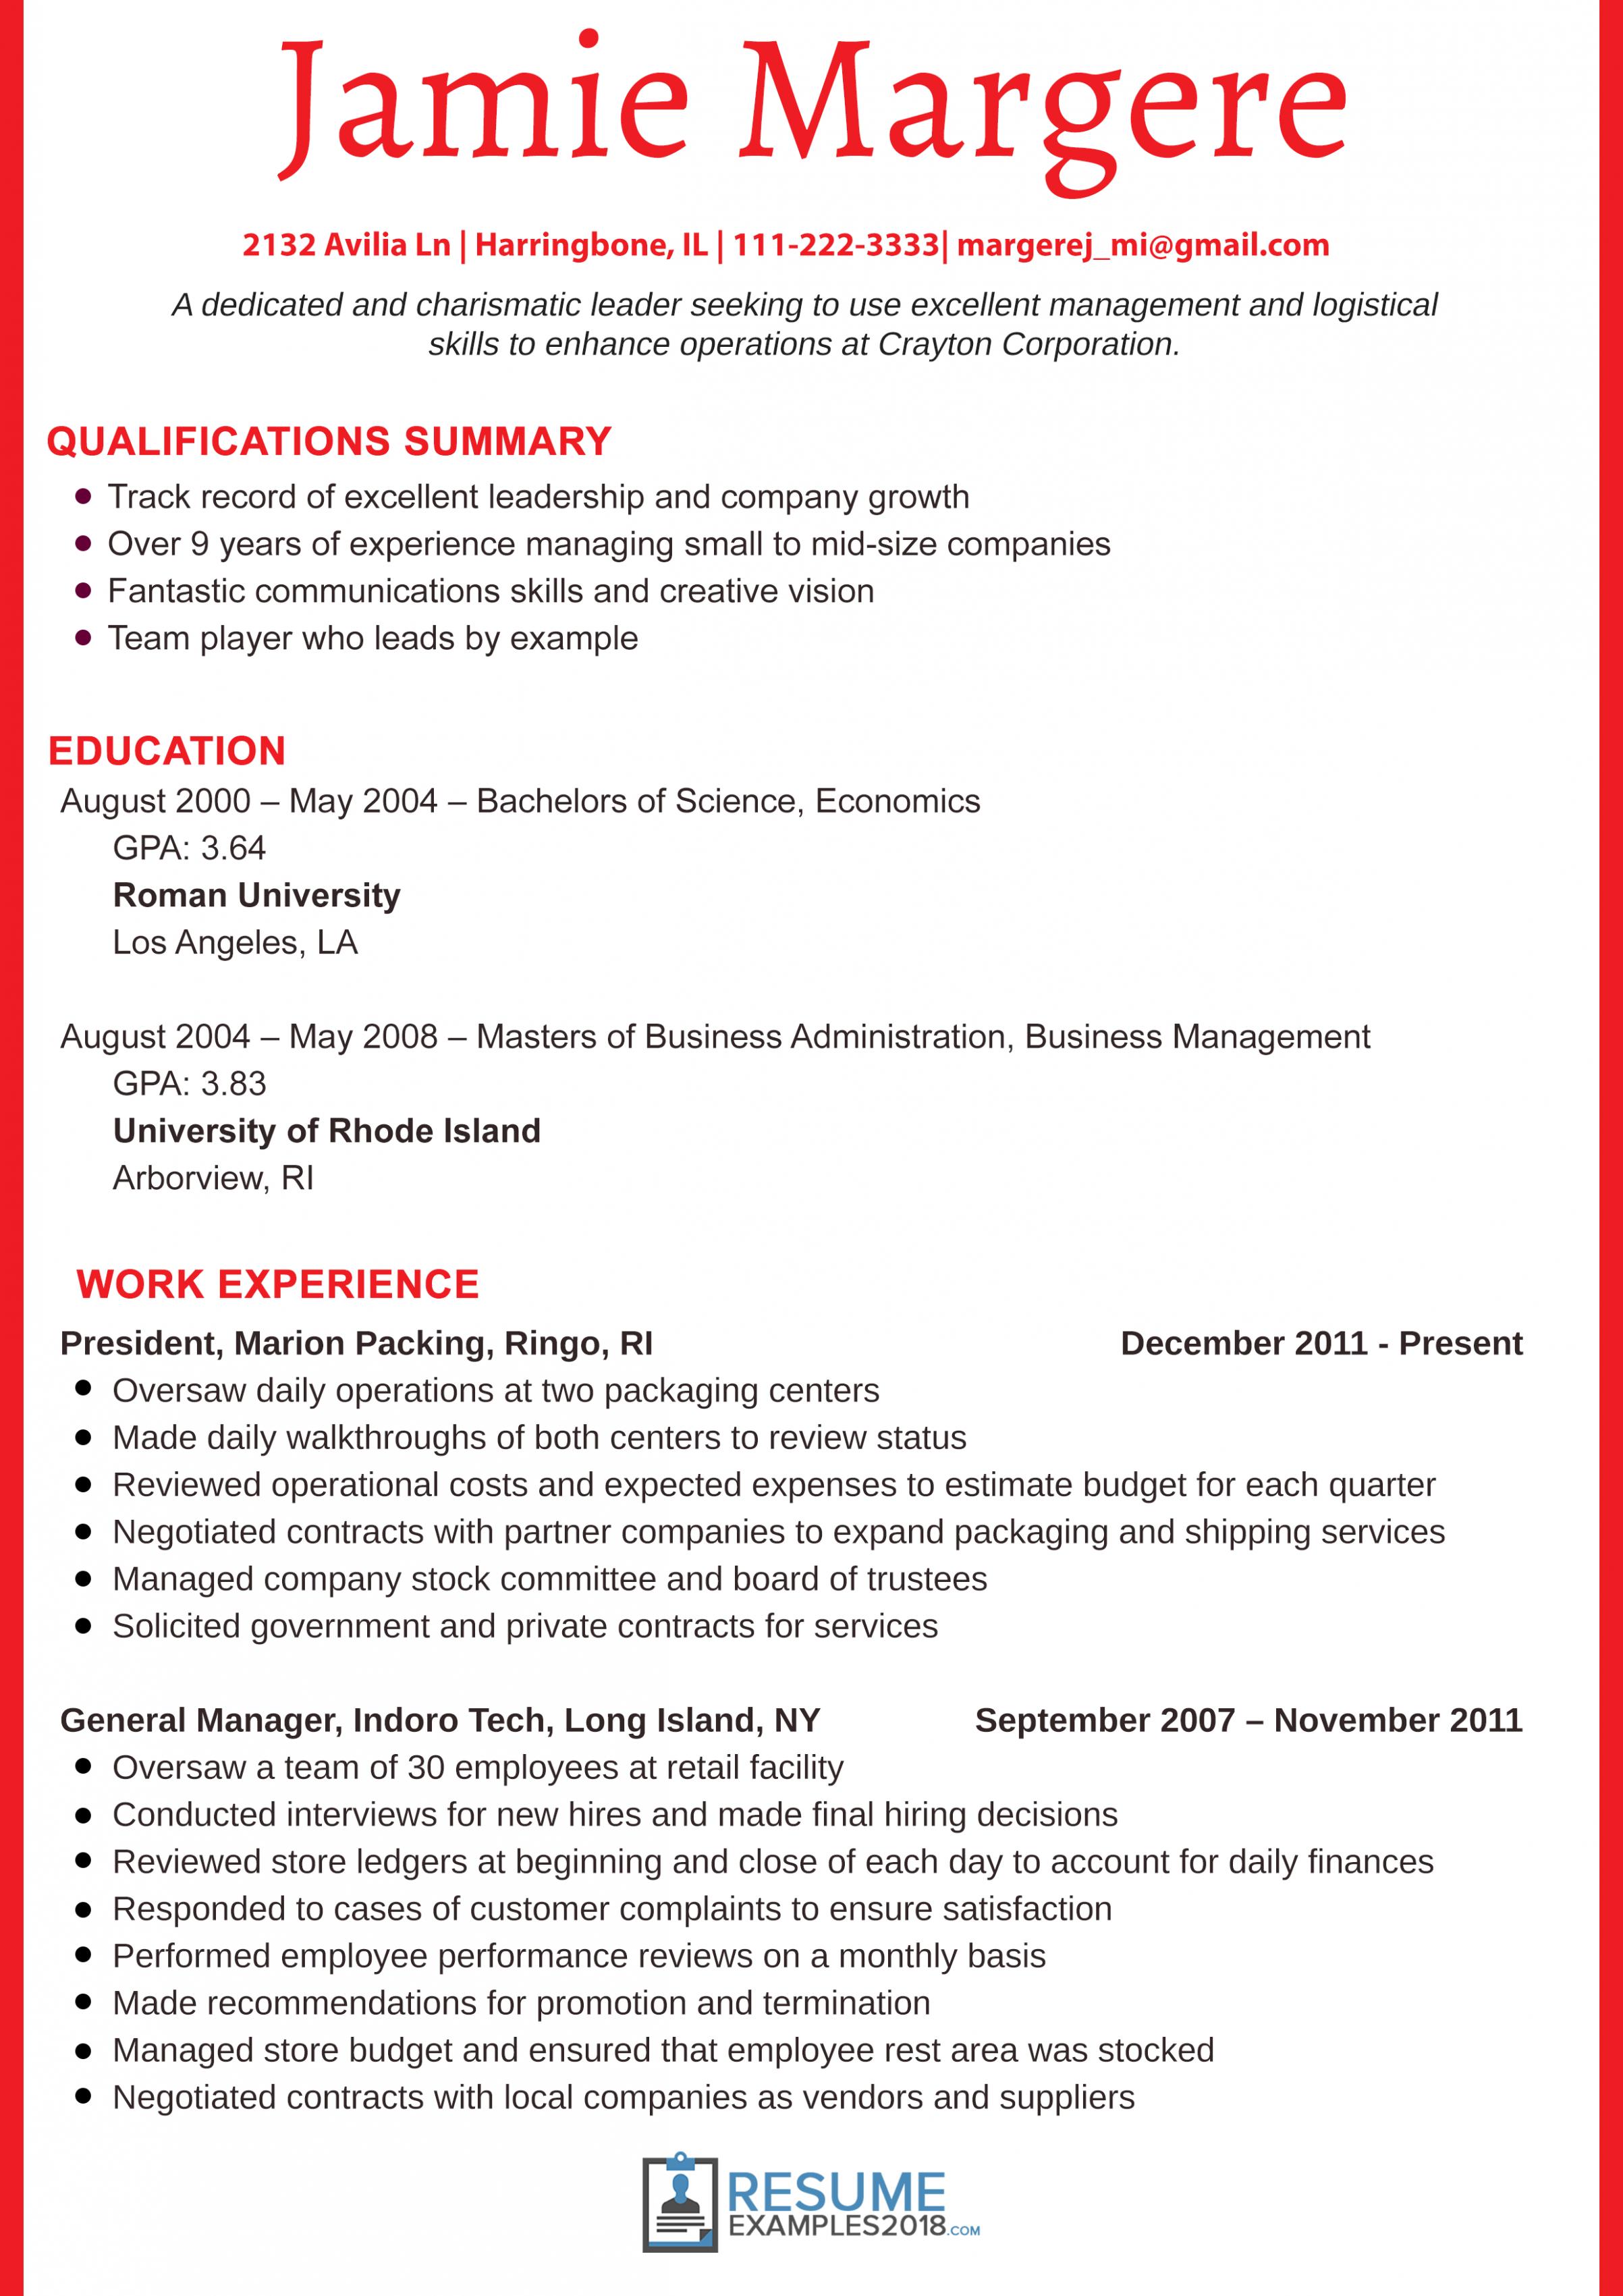 10 Primary Resume Examples 2018